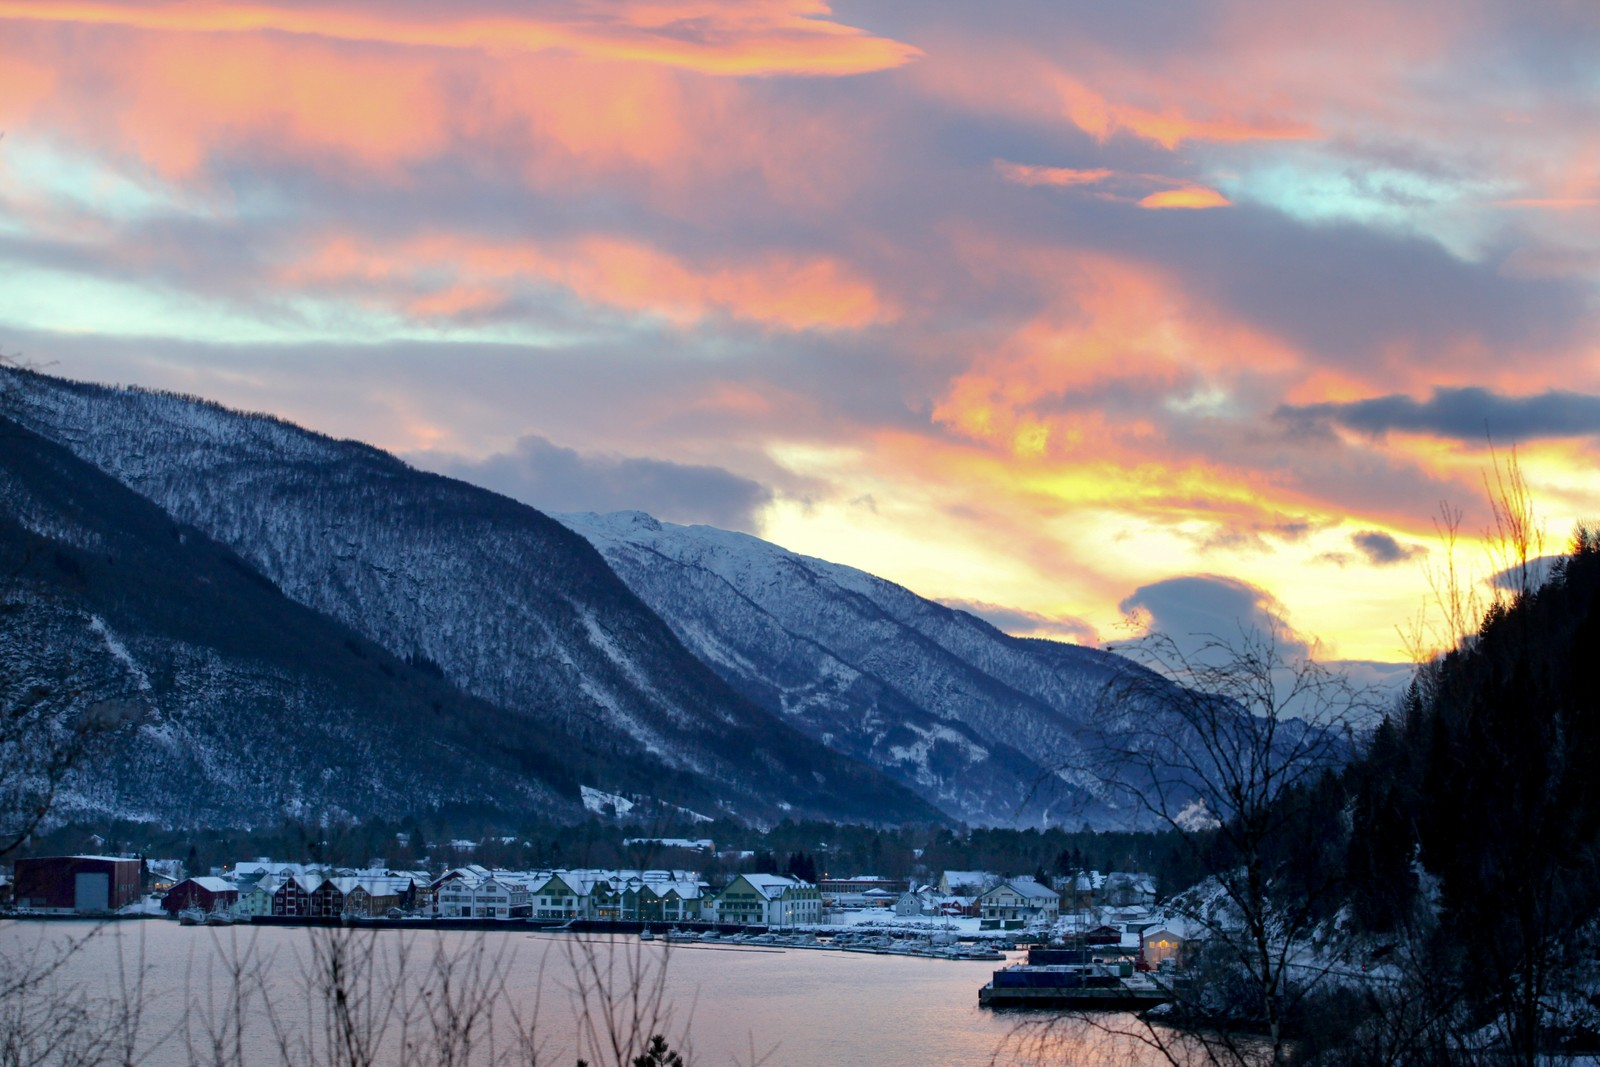 I Saltdal kommune bor det under 5 000 innbyggere. Det er like mange kommuner i Norge som er mindre enn Saltdal, som det er som er større enn nordlandskommunen.